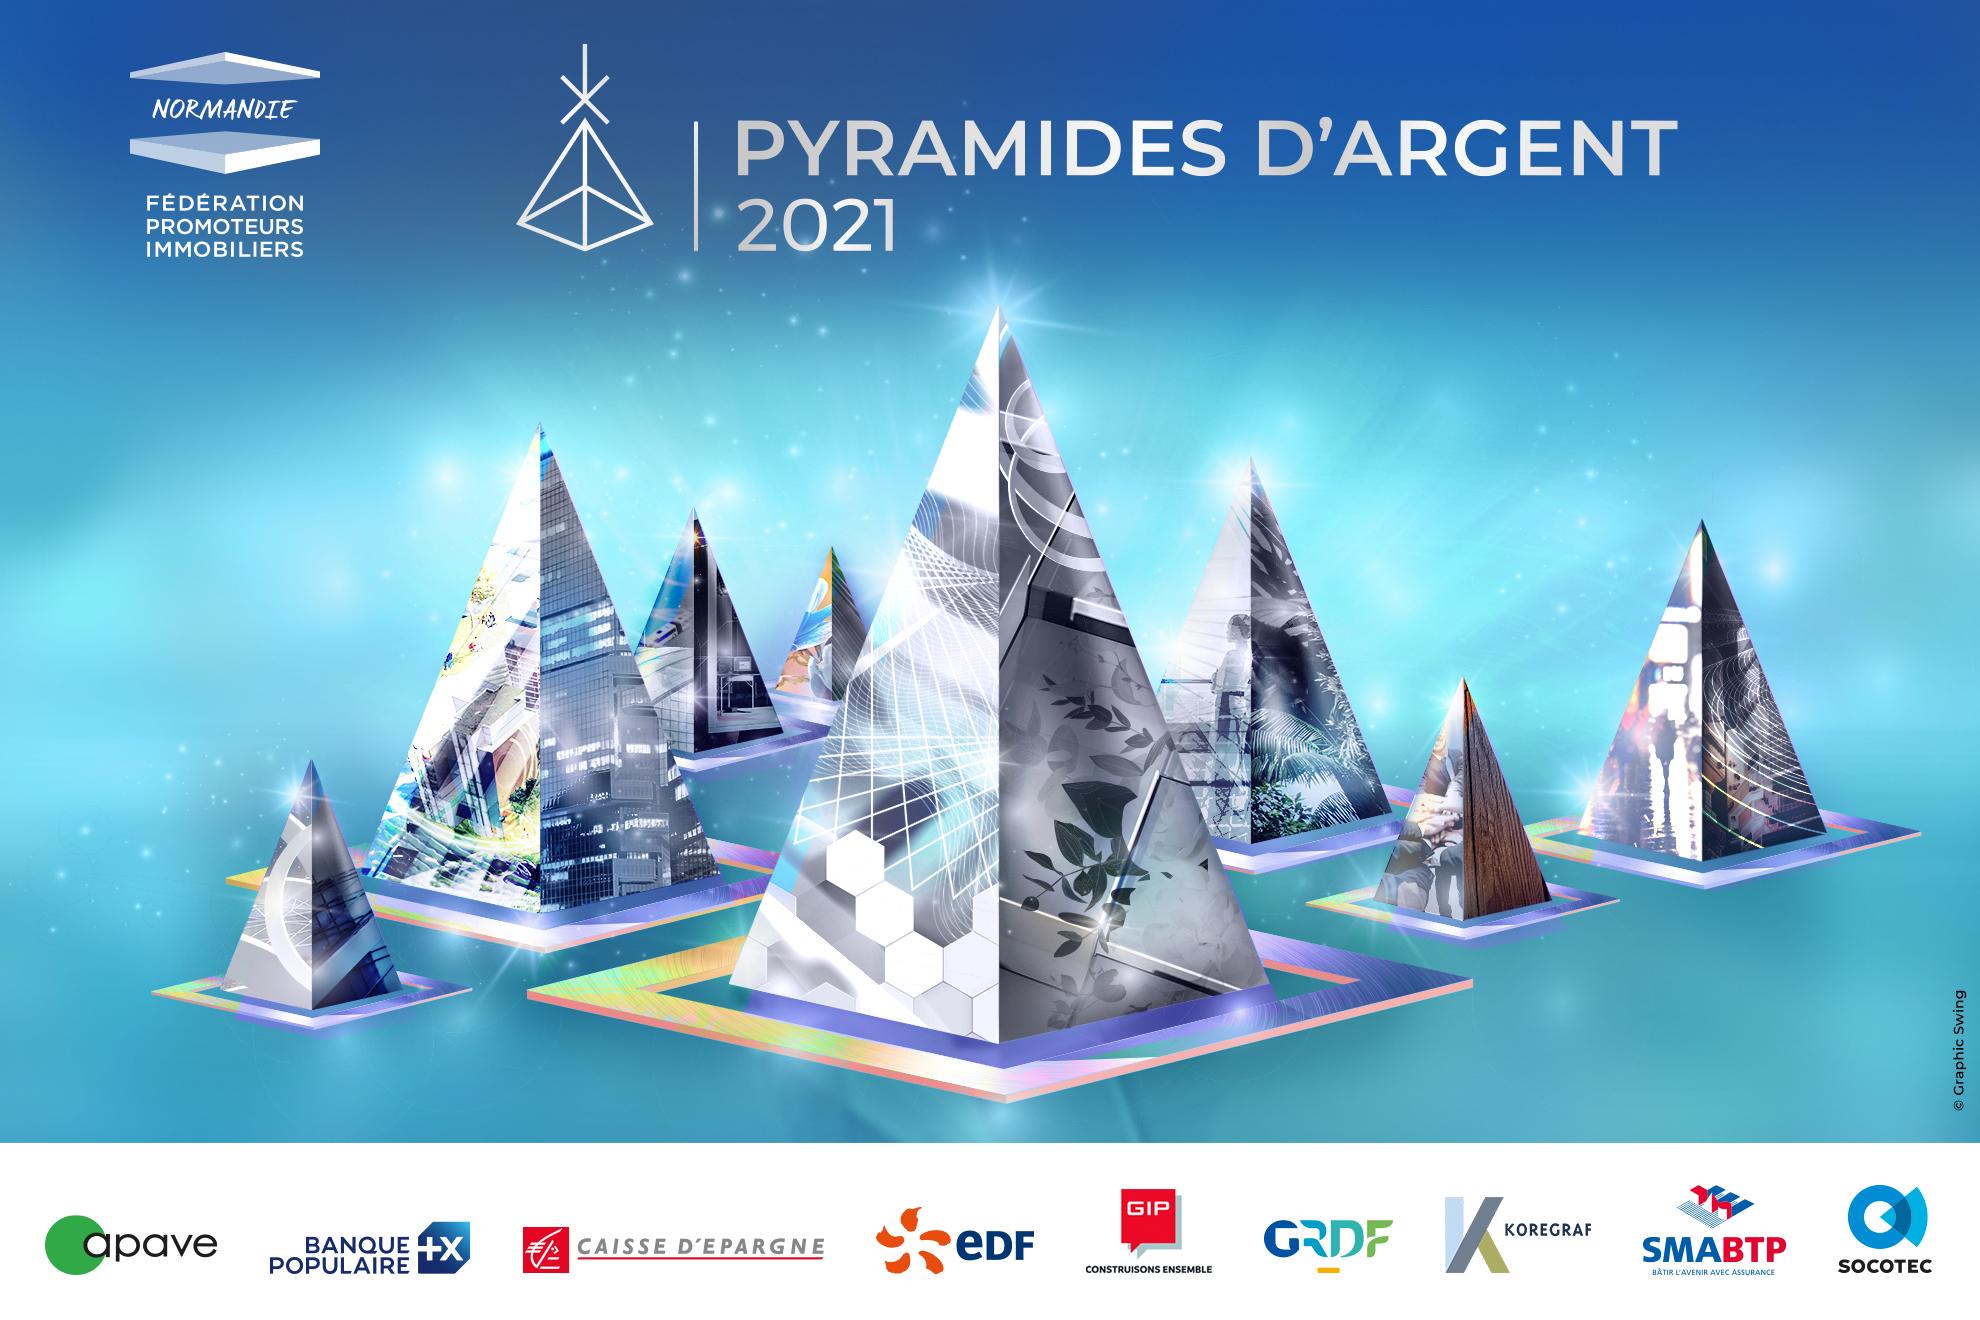 pyramides-fpi-2021